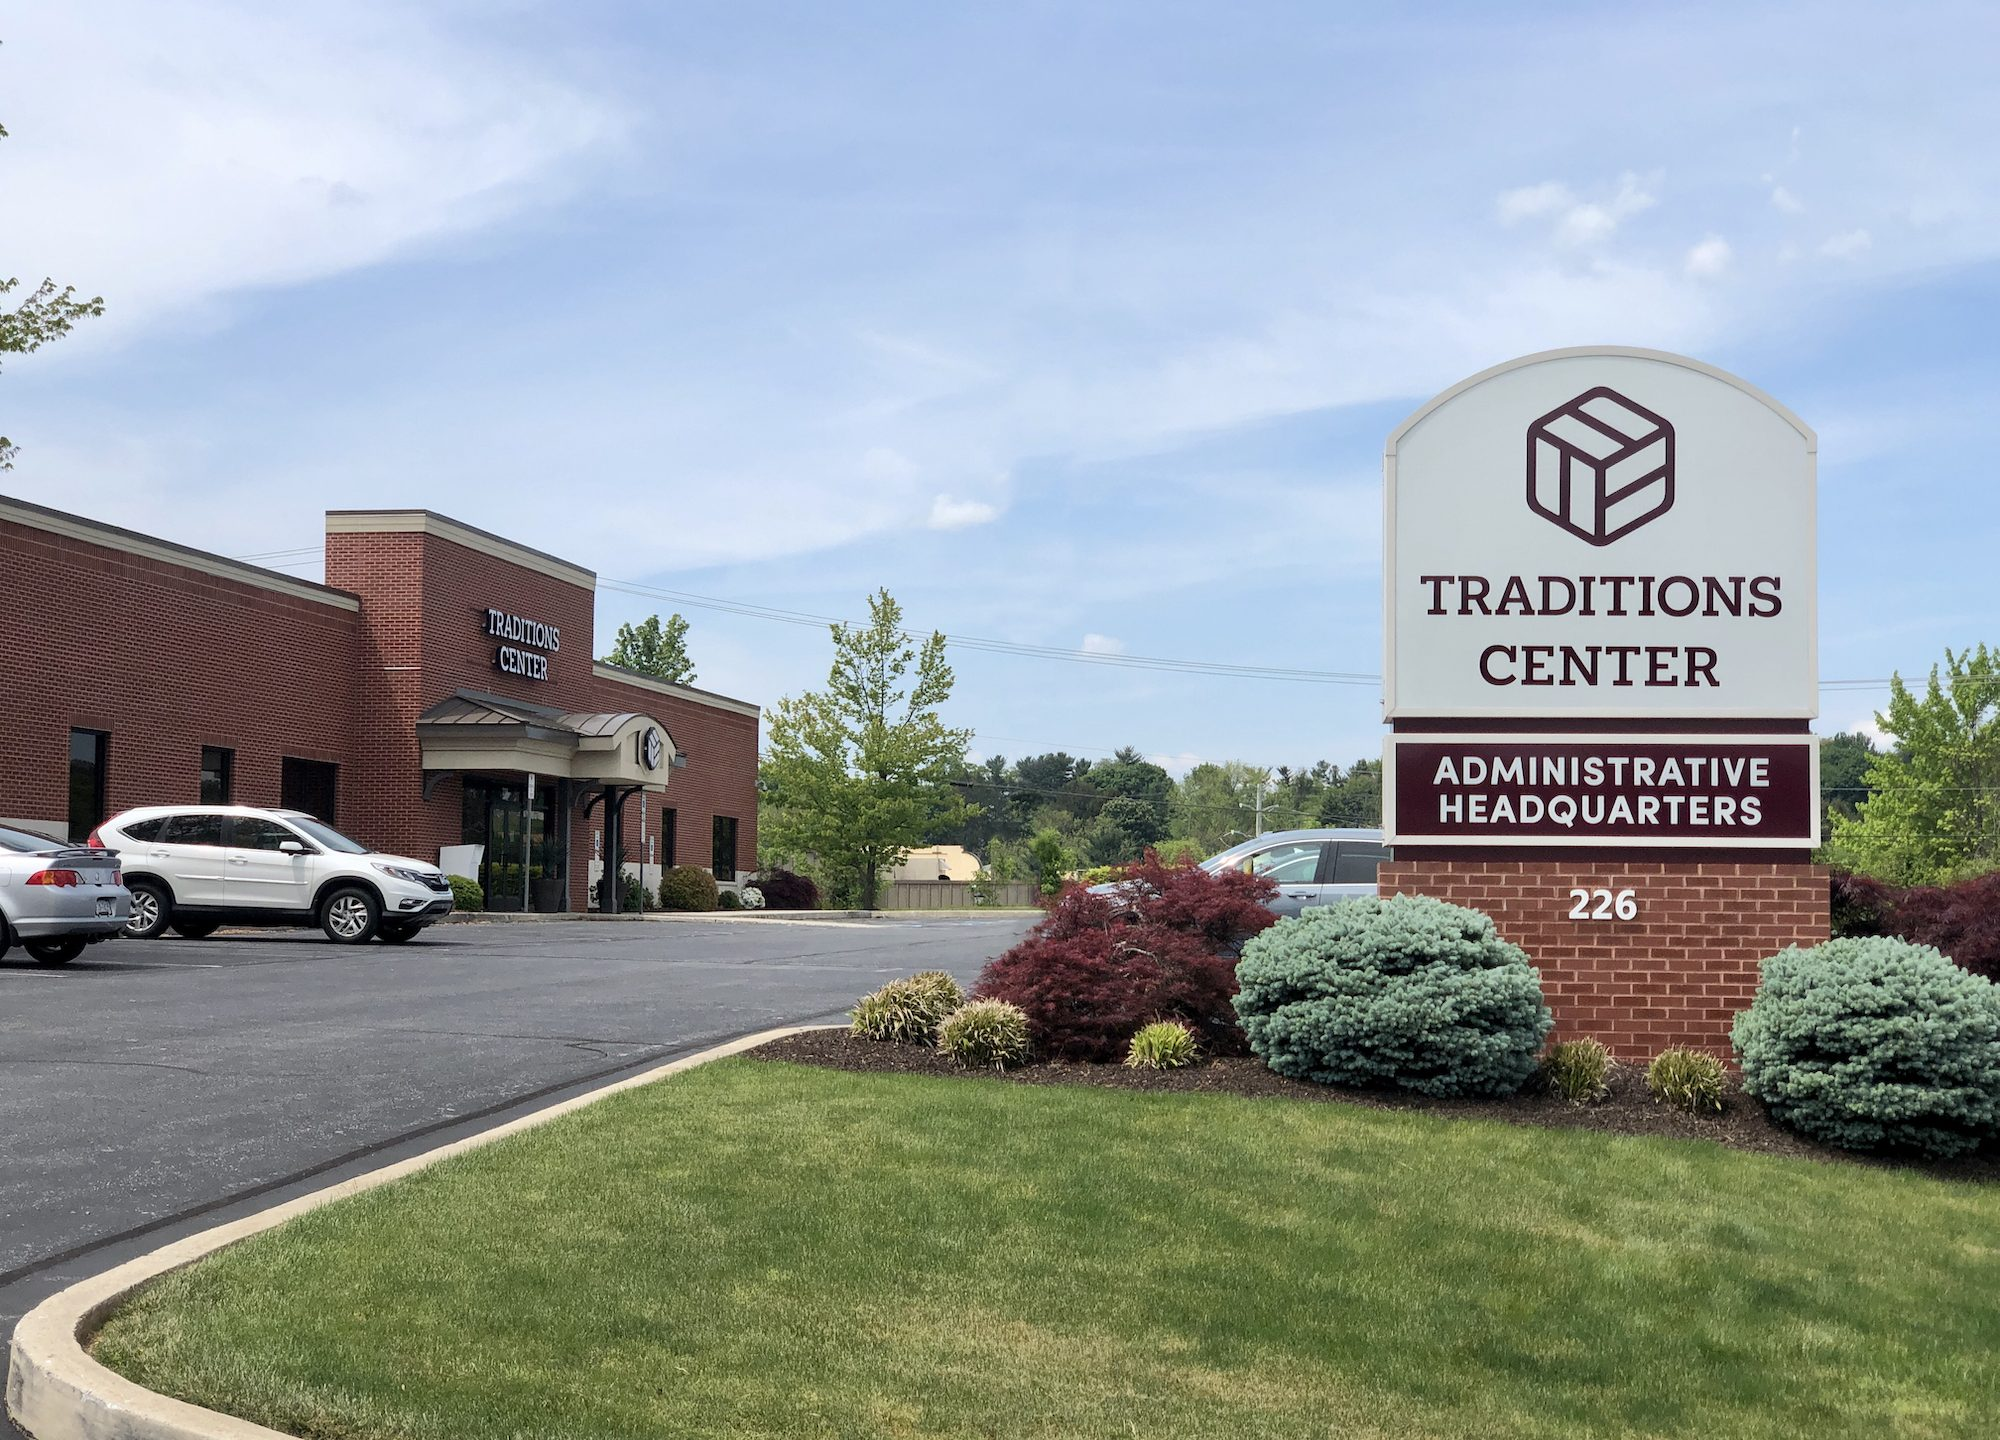 Traditions Center Administrative Headquarters at 226 Pauline Drive, York Pennsylvania